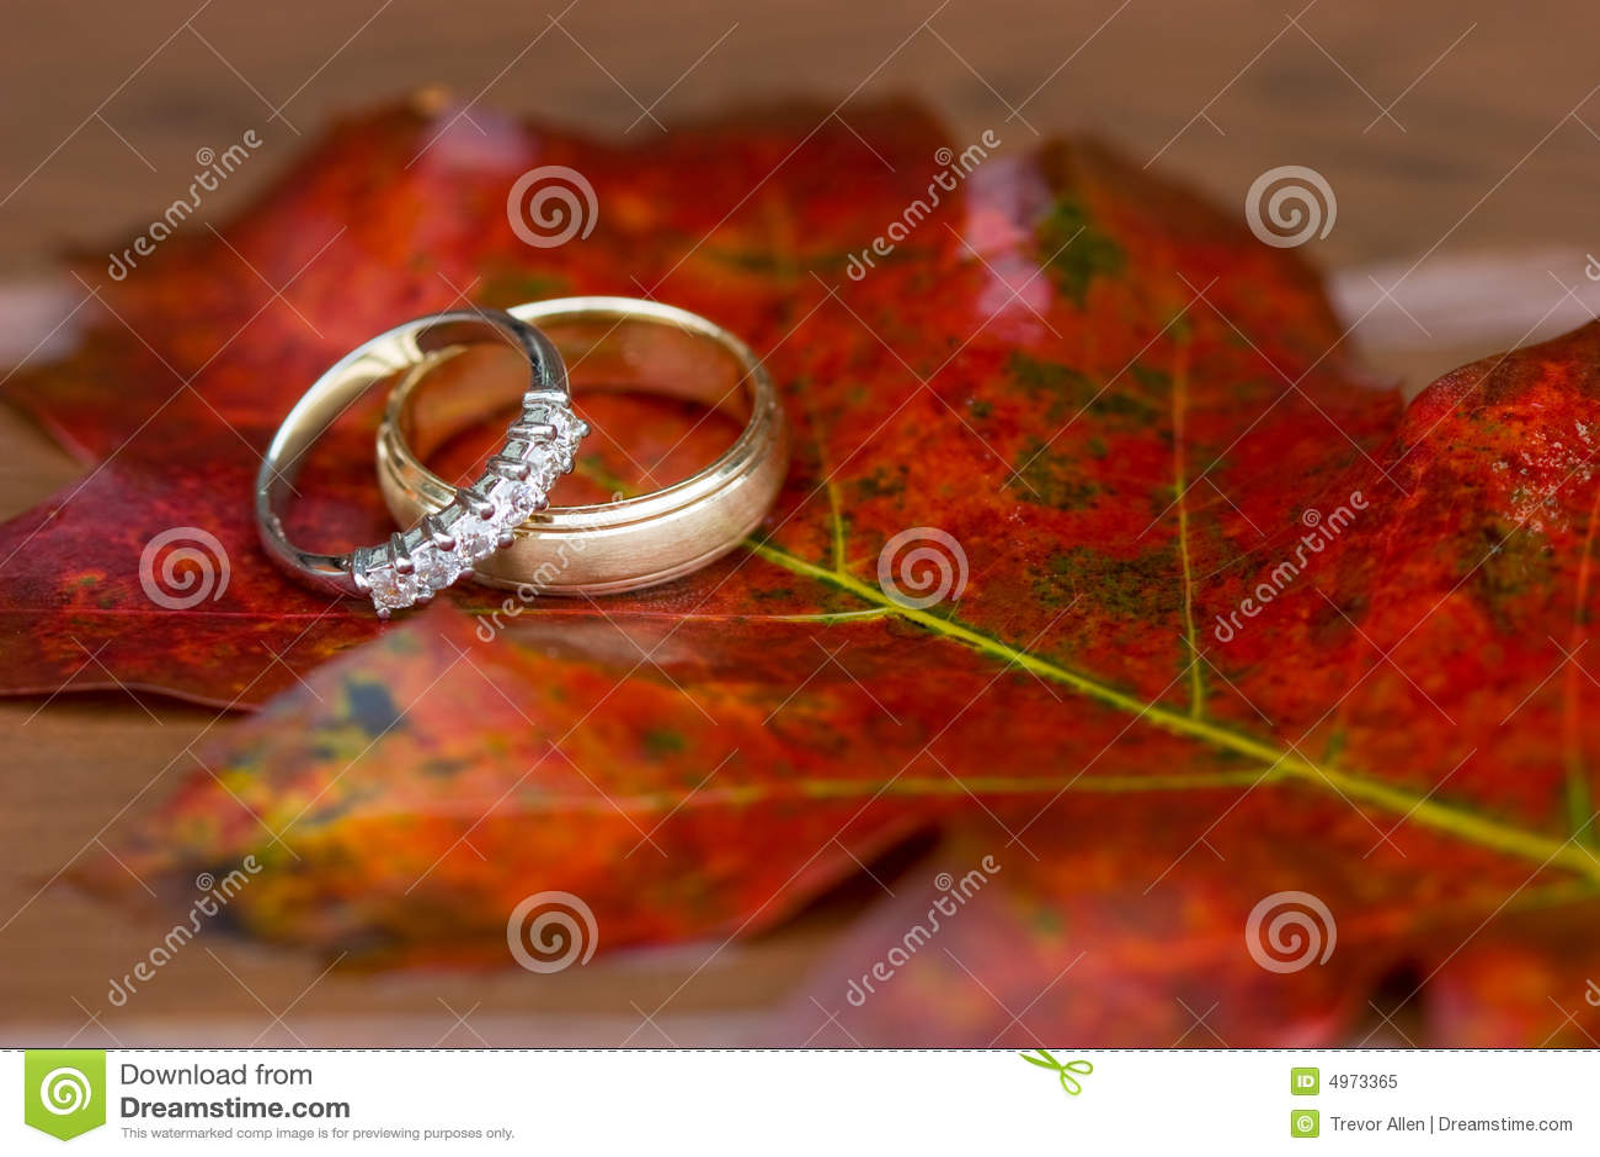 Wedding Rings in the Fall